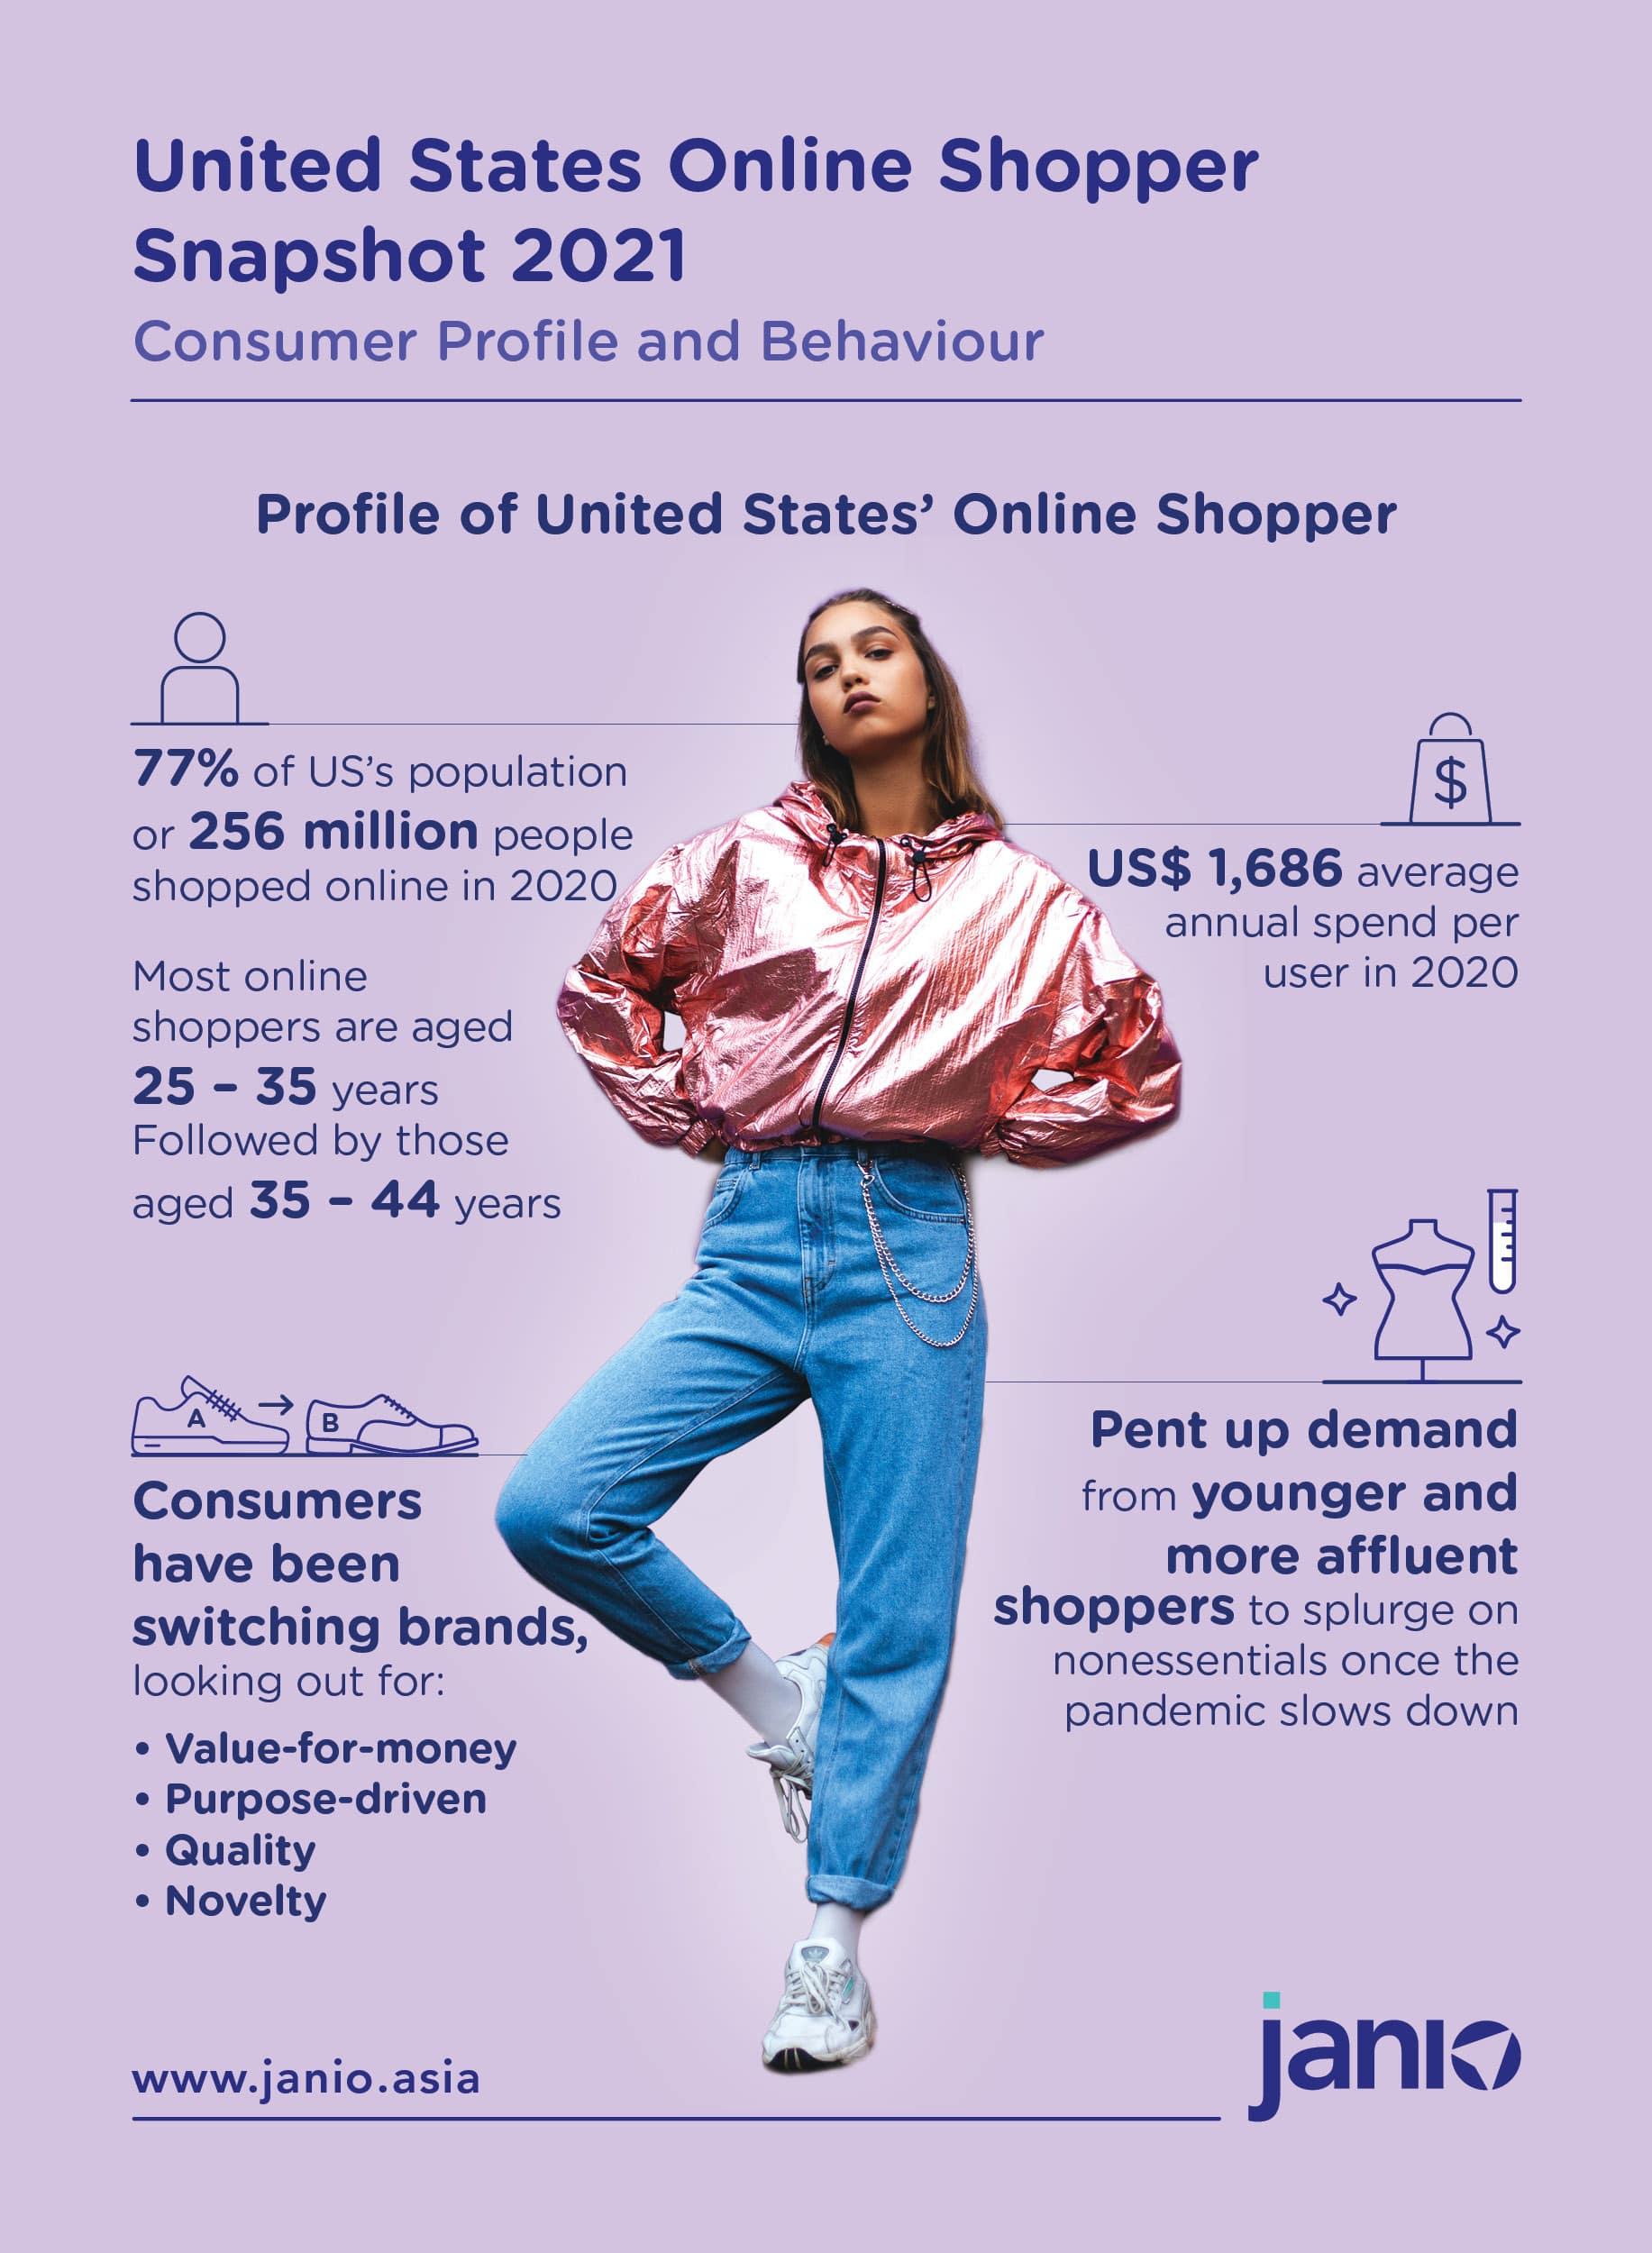 united-states-online-shopper-snapshot-2021-infographic-1-1-min.jpg